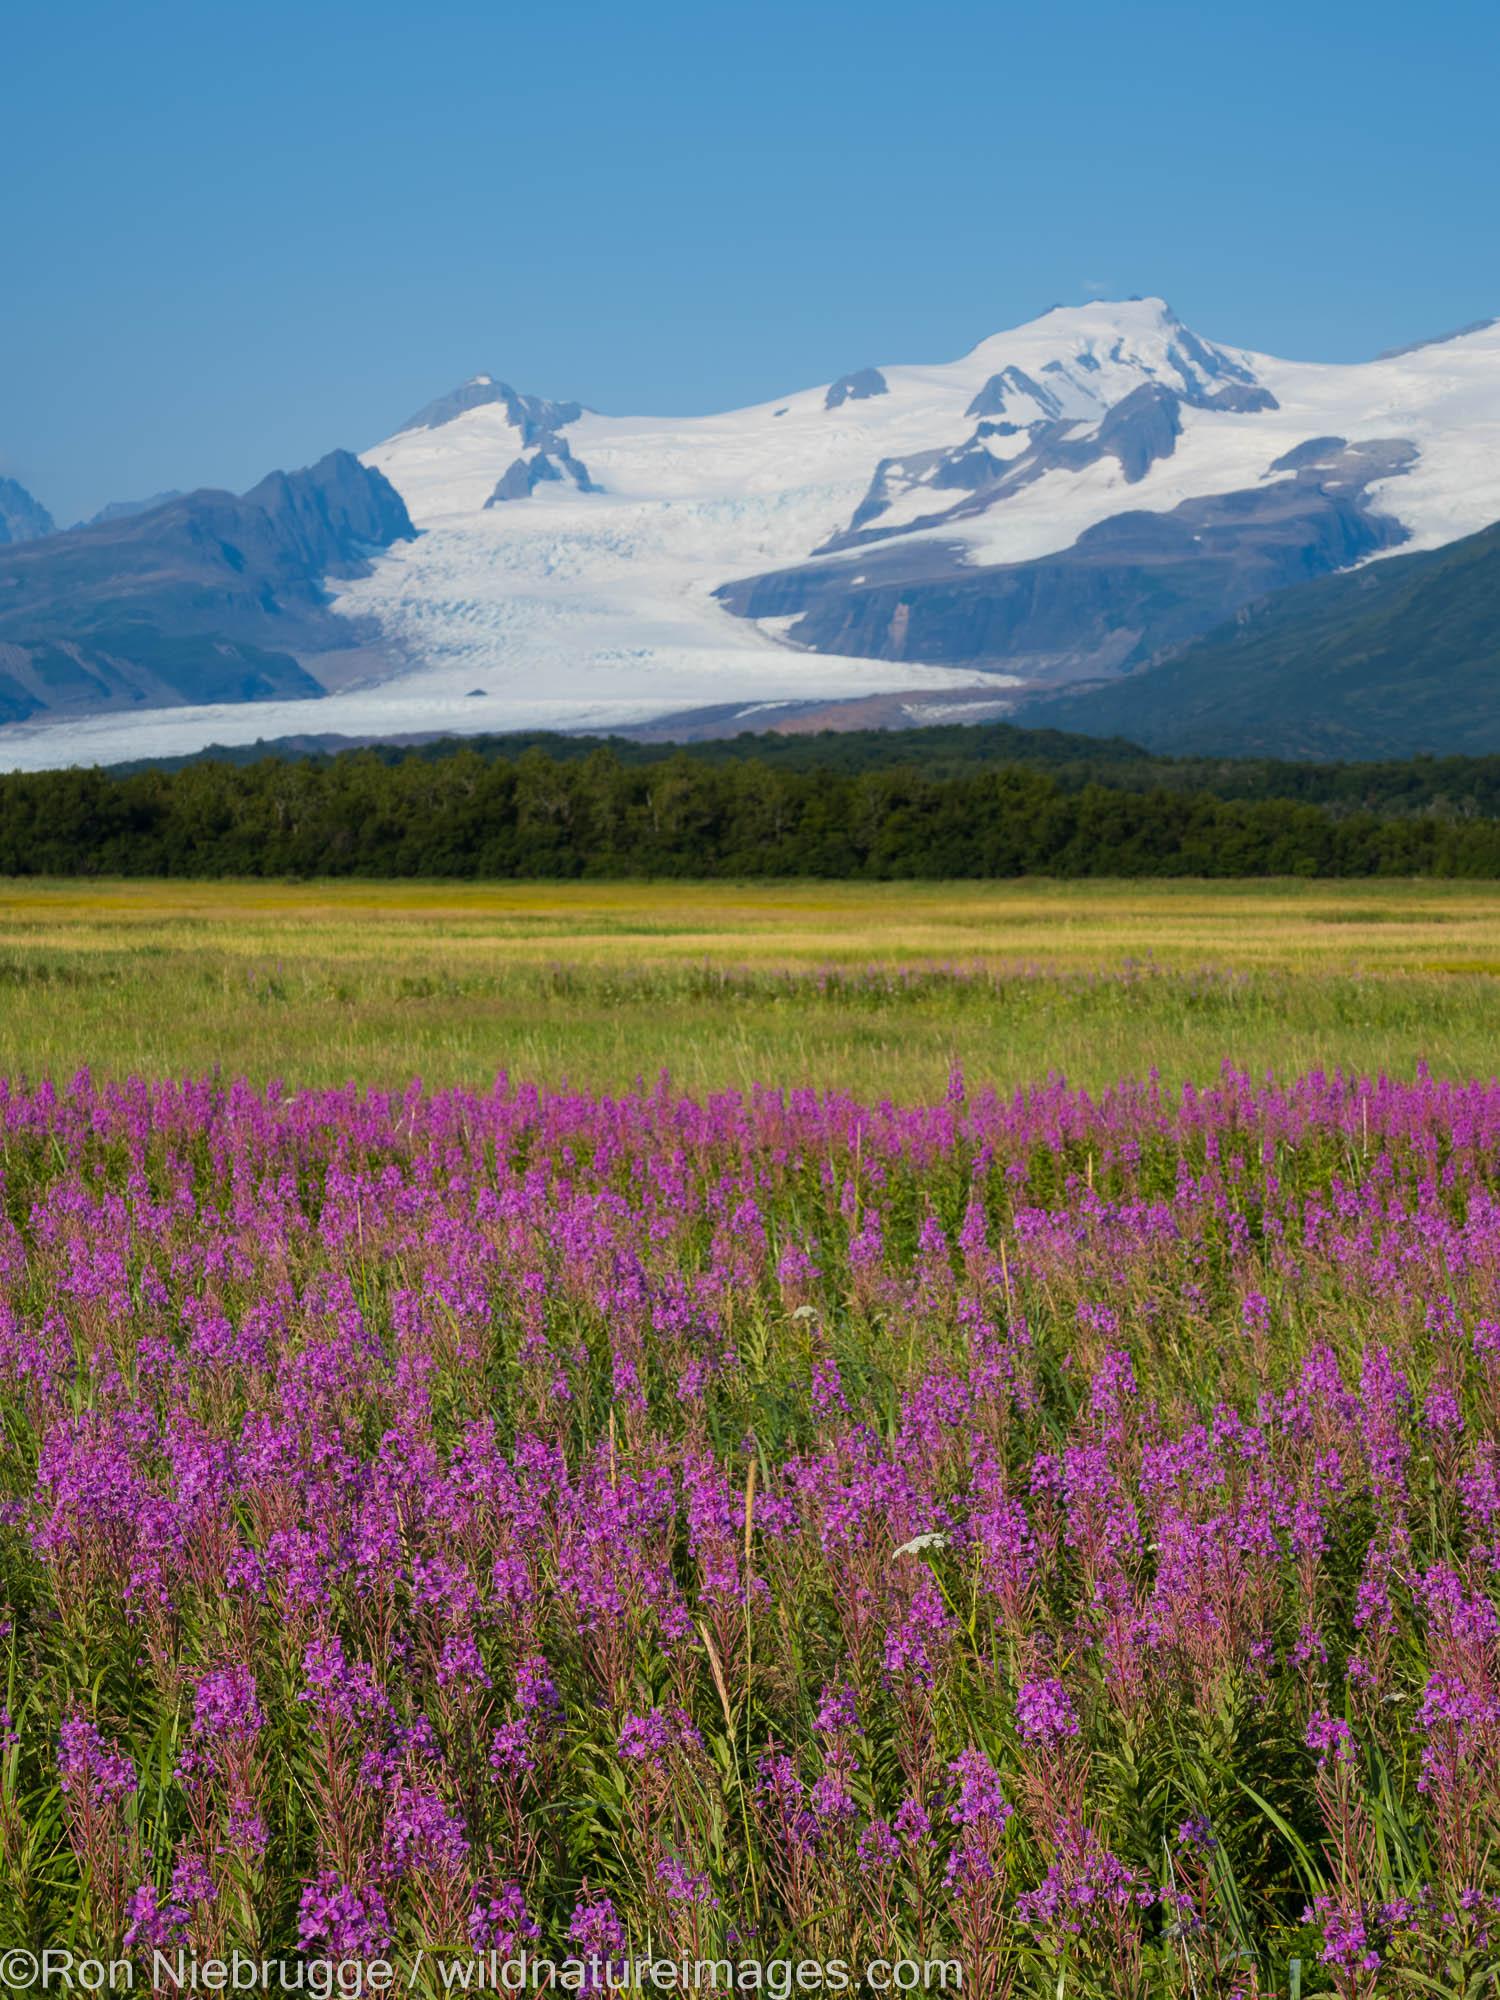 Field of fireweed, Hallo Bay, Katmai National Park, Alaska.